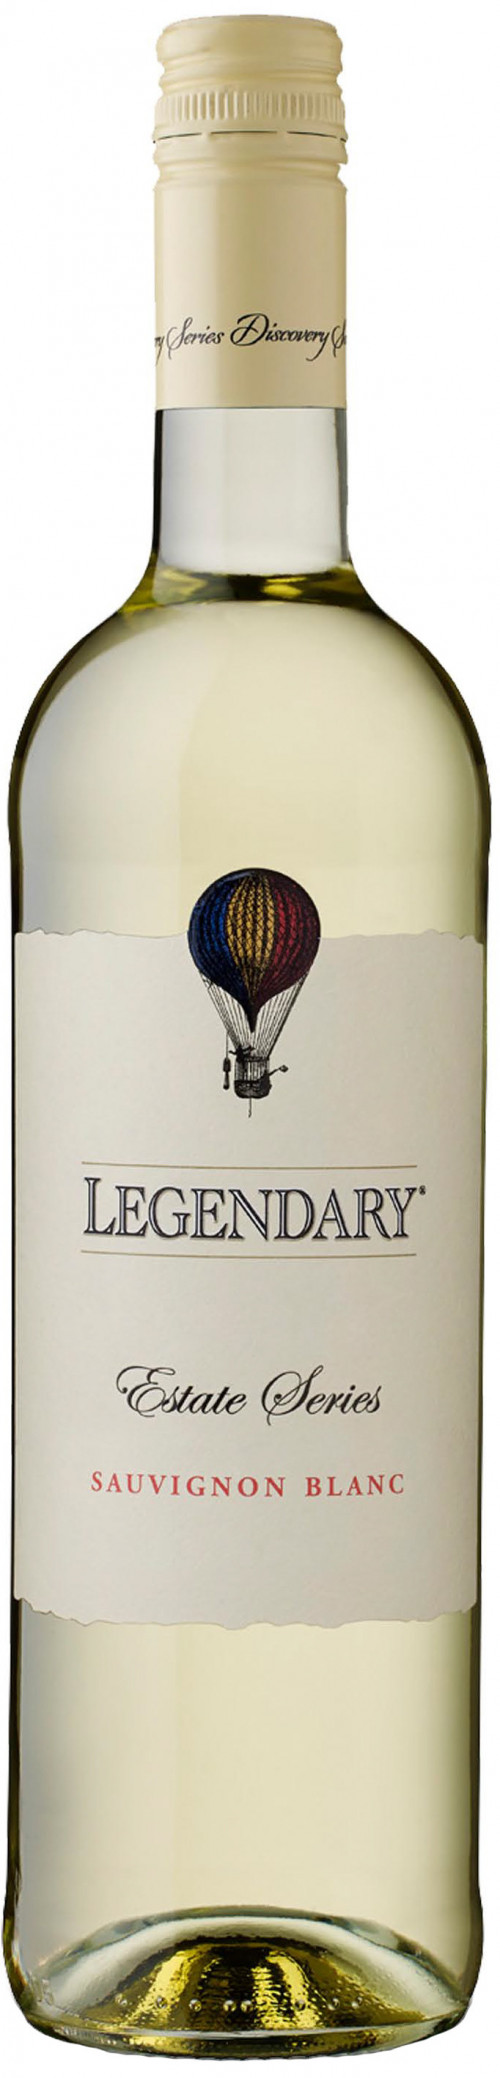 Legendary Sauvignon Blanc 1.5 Ltr